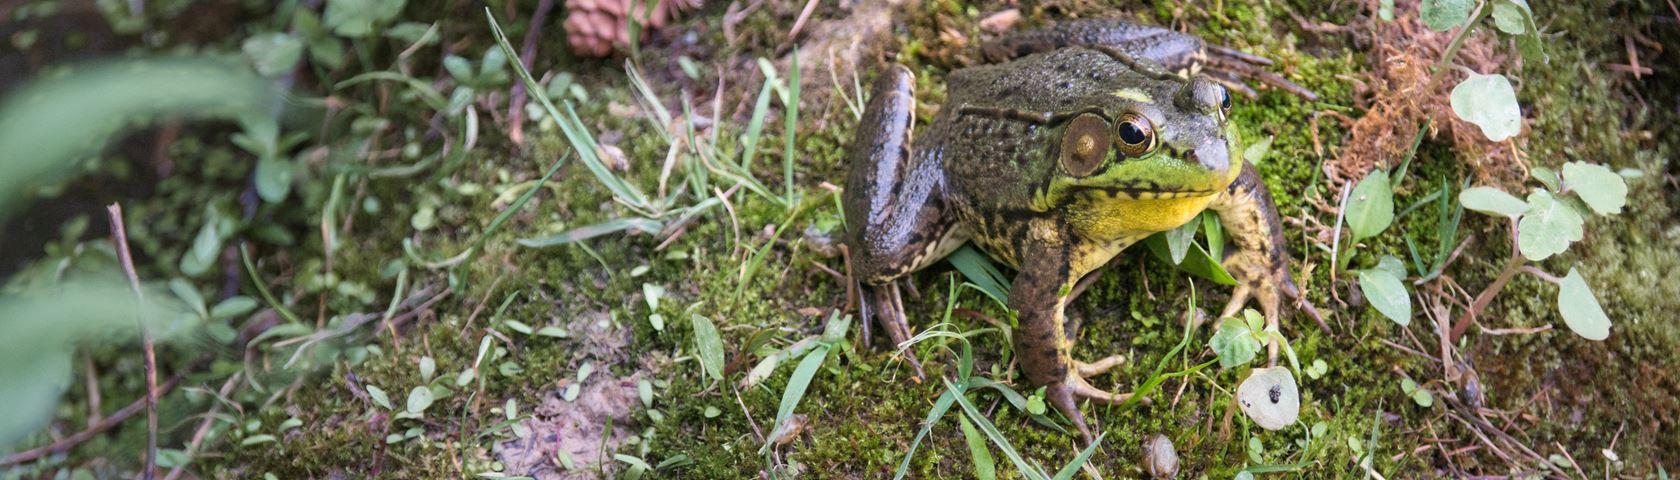 Friendly Frog